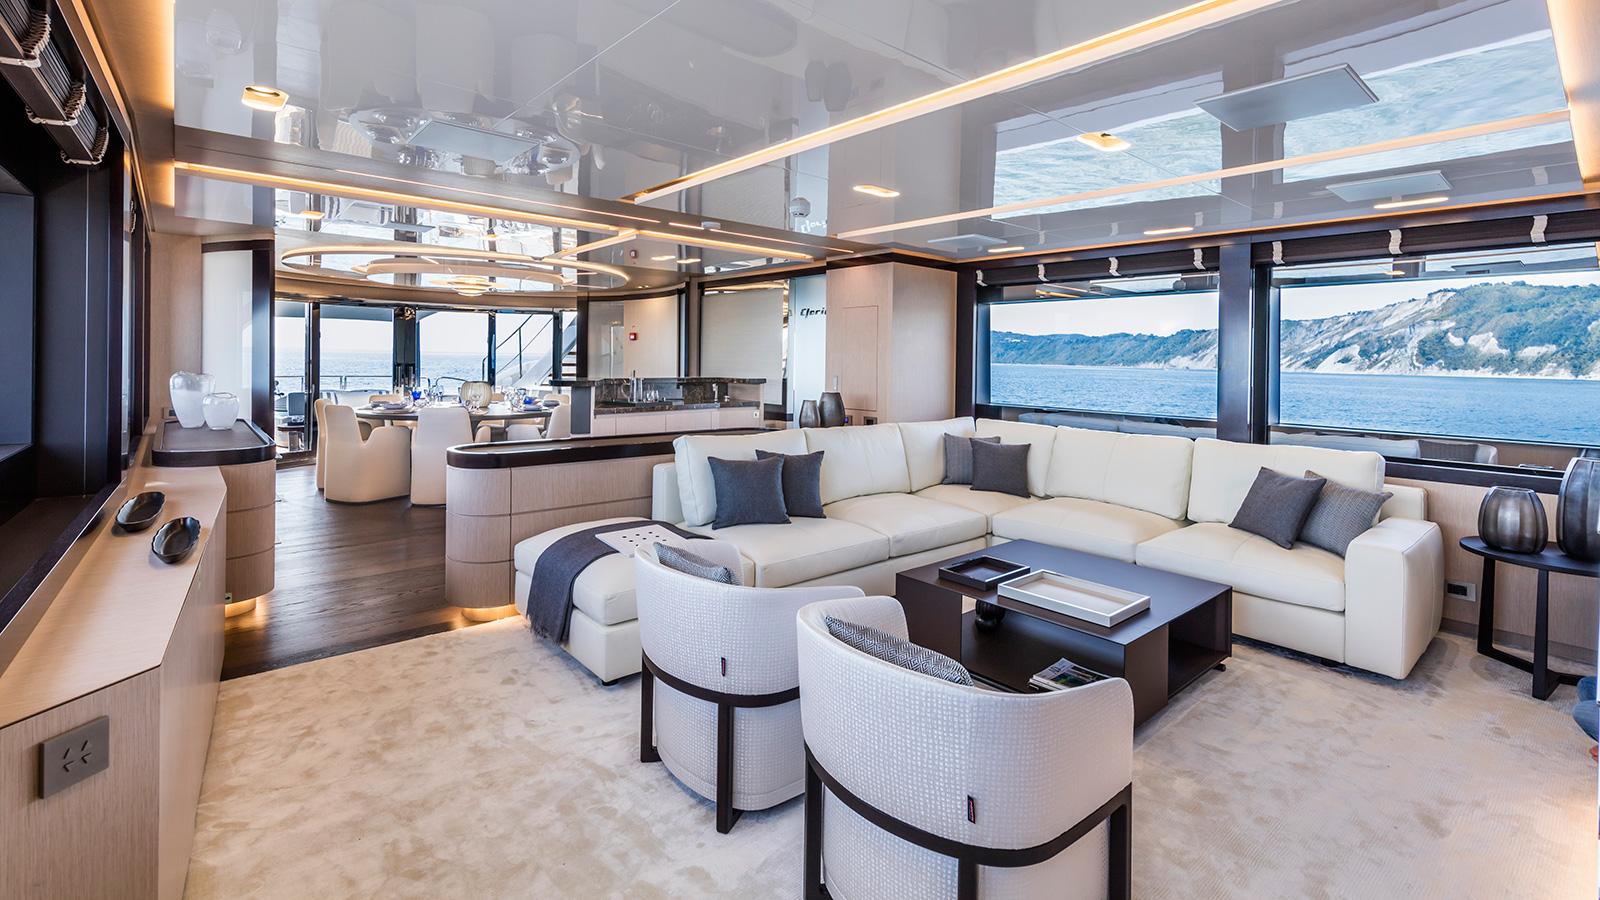 the-saloon-of-the-isa-motor-yacht-clorinda